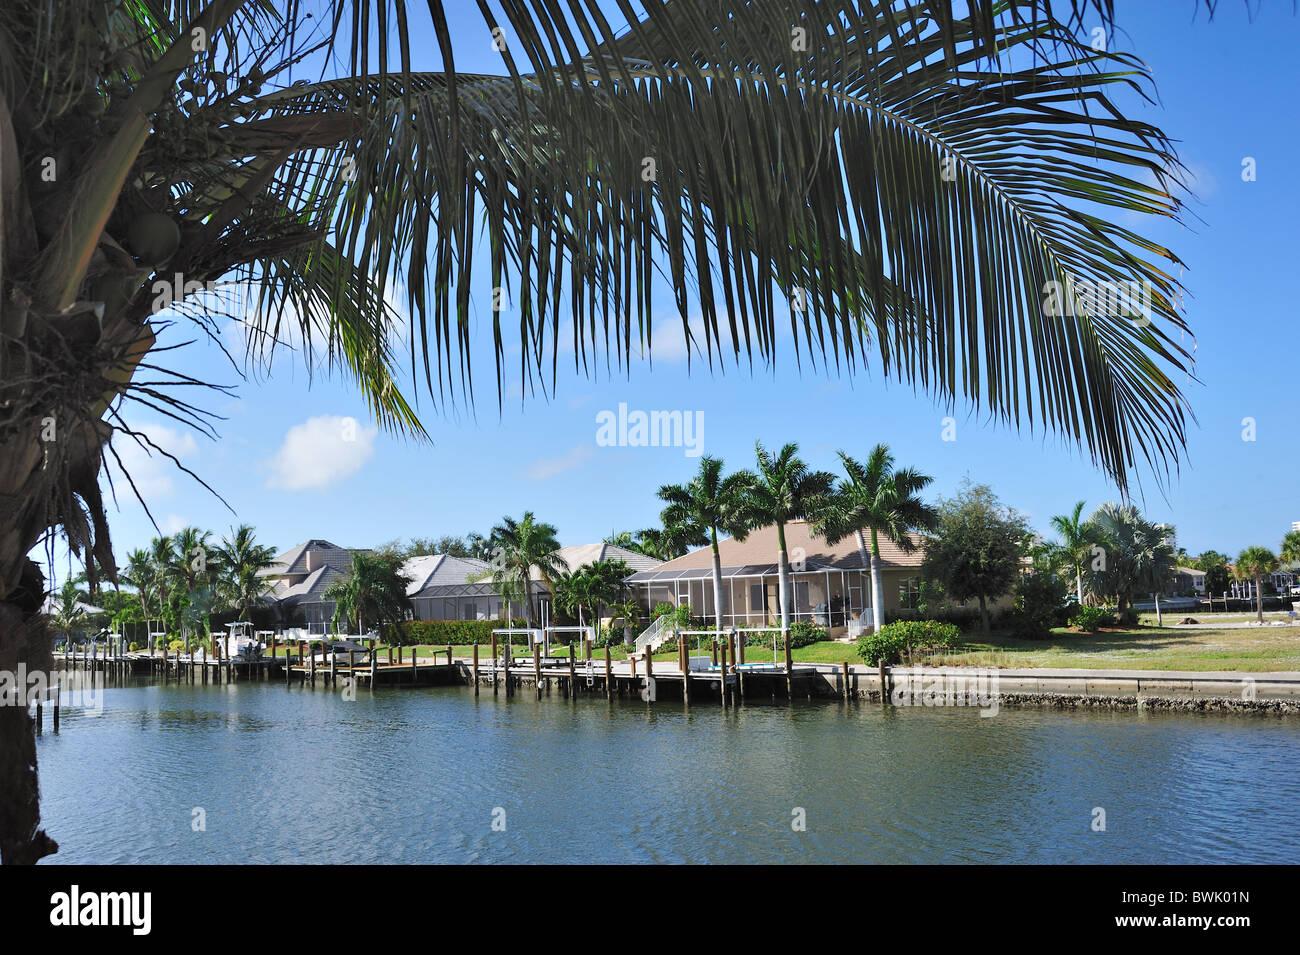 Marco Island, Florida Stockbild